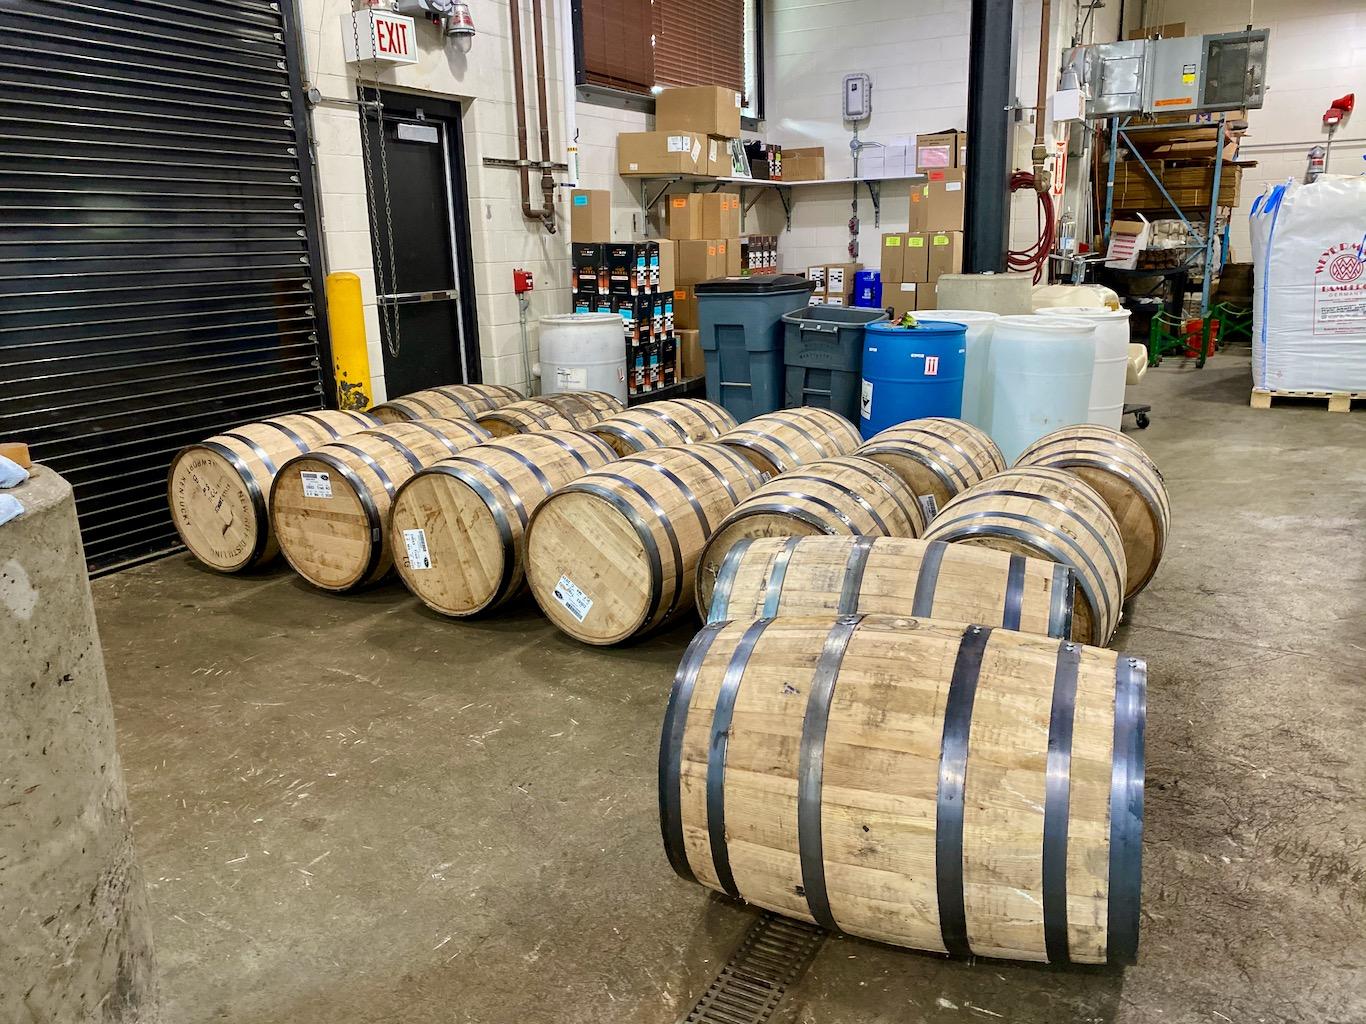 Barreling Area - New Riff Distilling Distillery